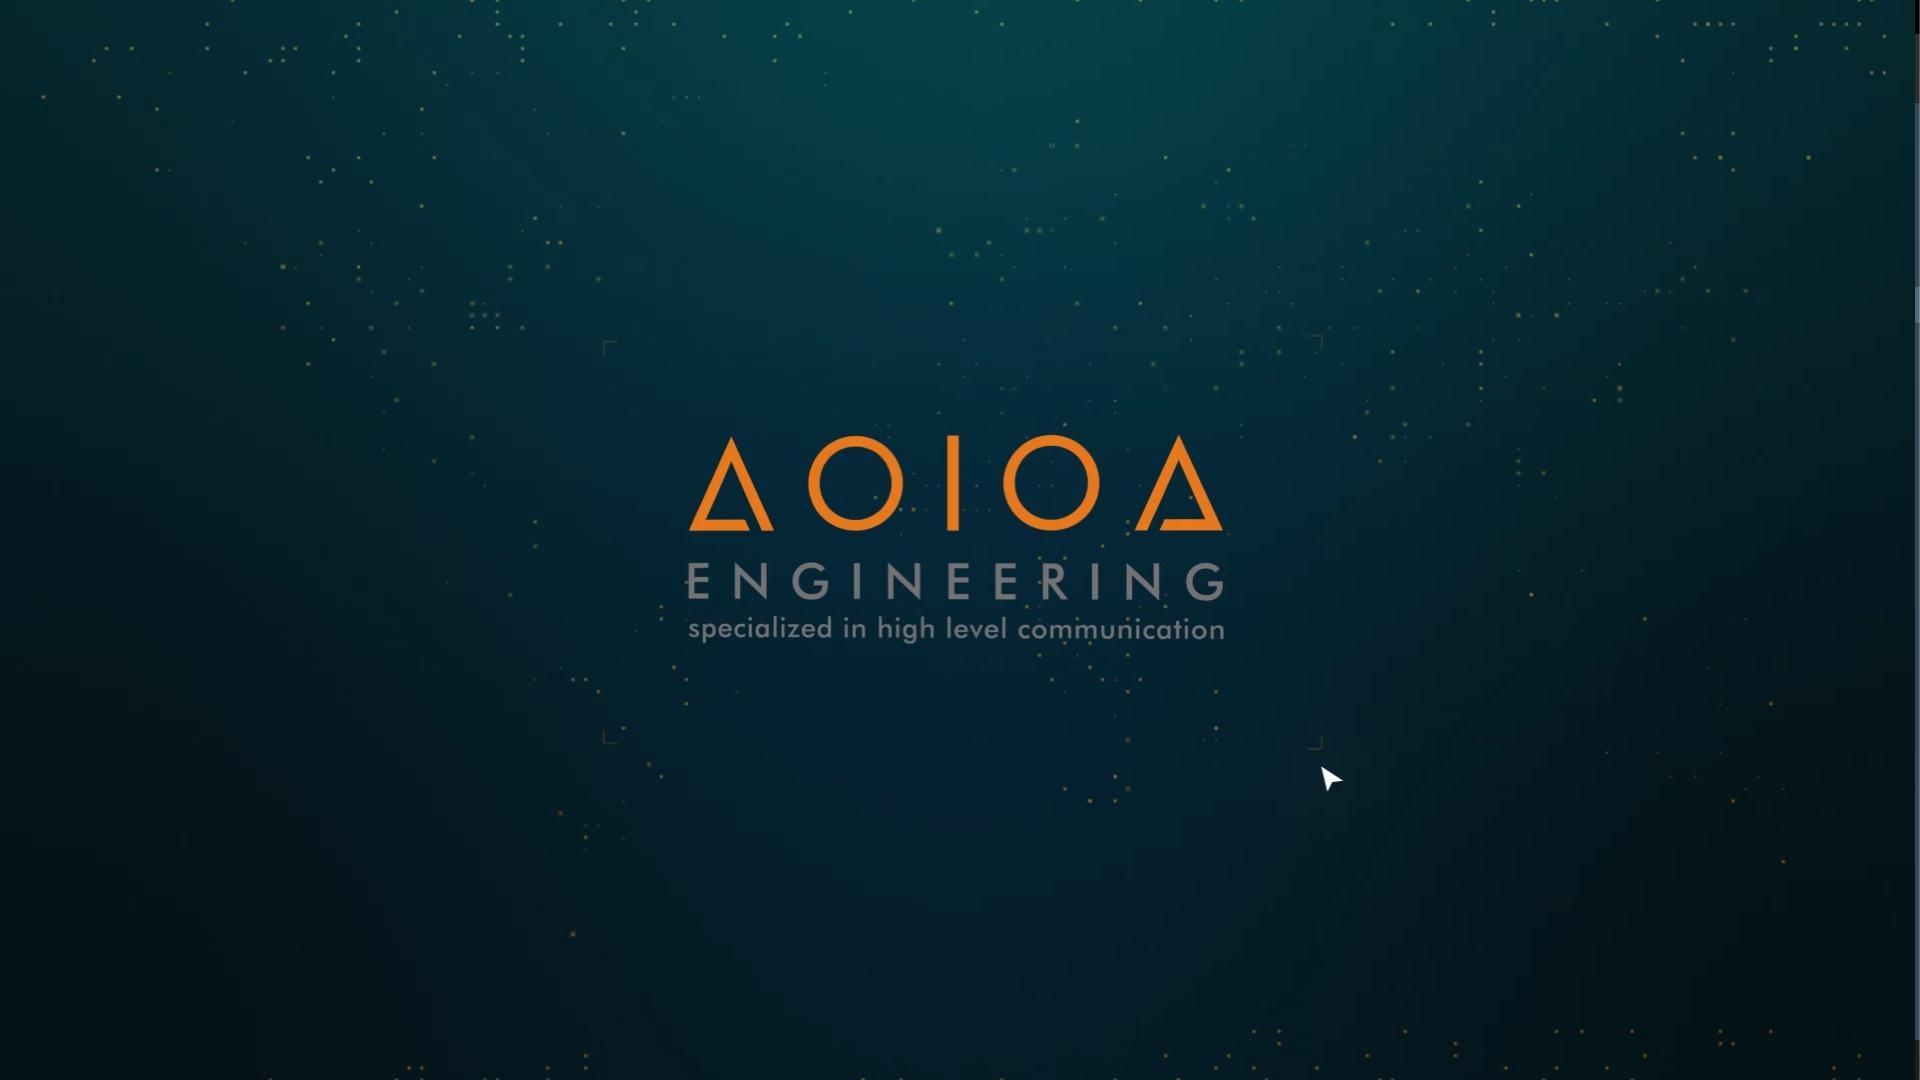 https://aoloa.de/sites/default/files/revslider/image/aoloa_cover.jpg